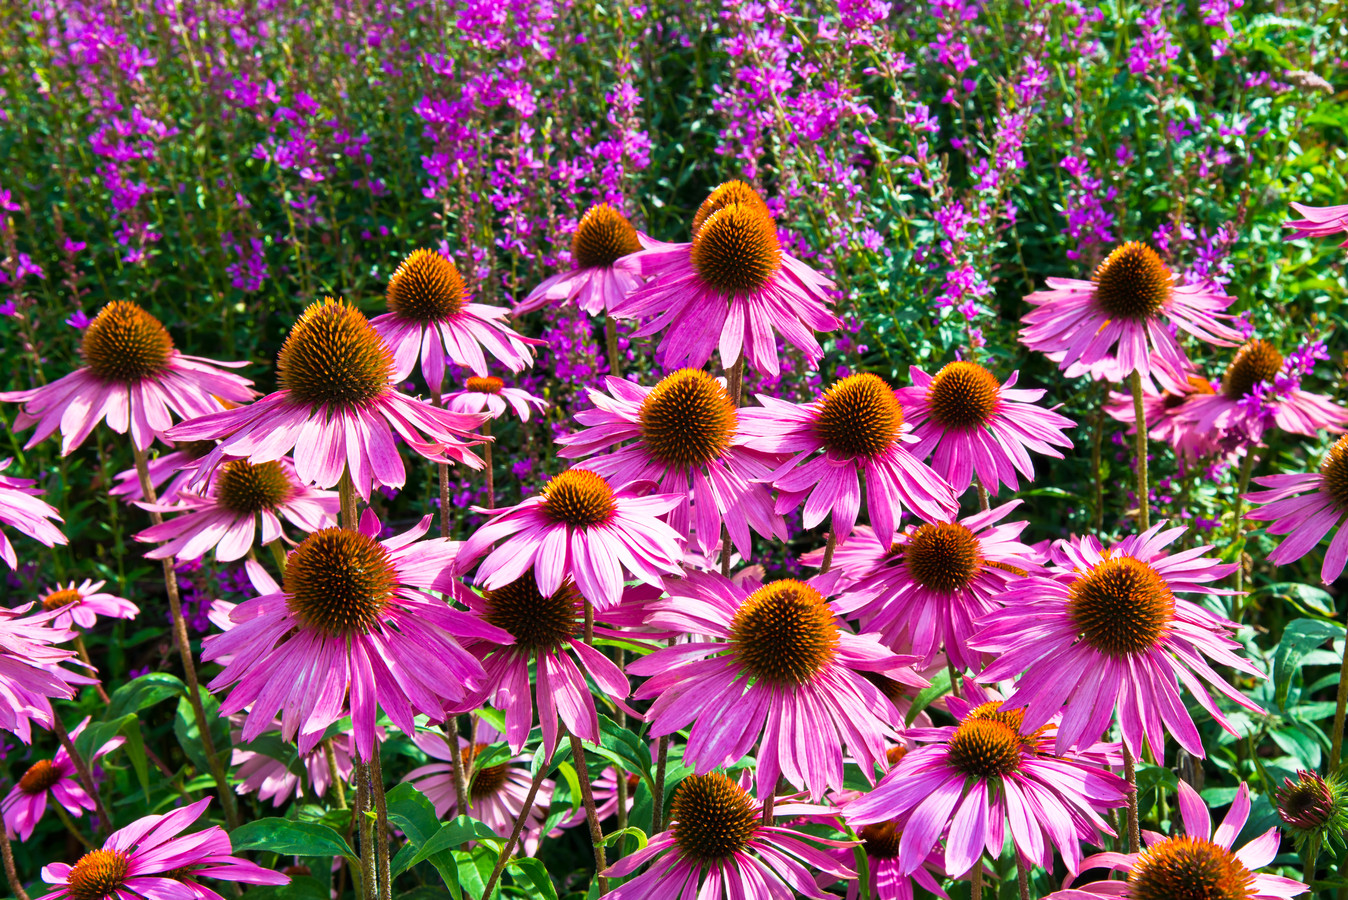 Echinacea purpurea 'Vintage Wine' (rode zonnehoed)